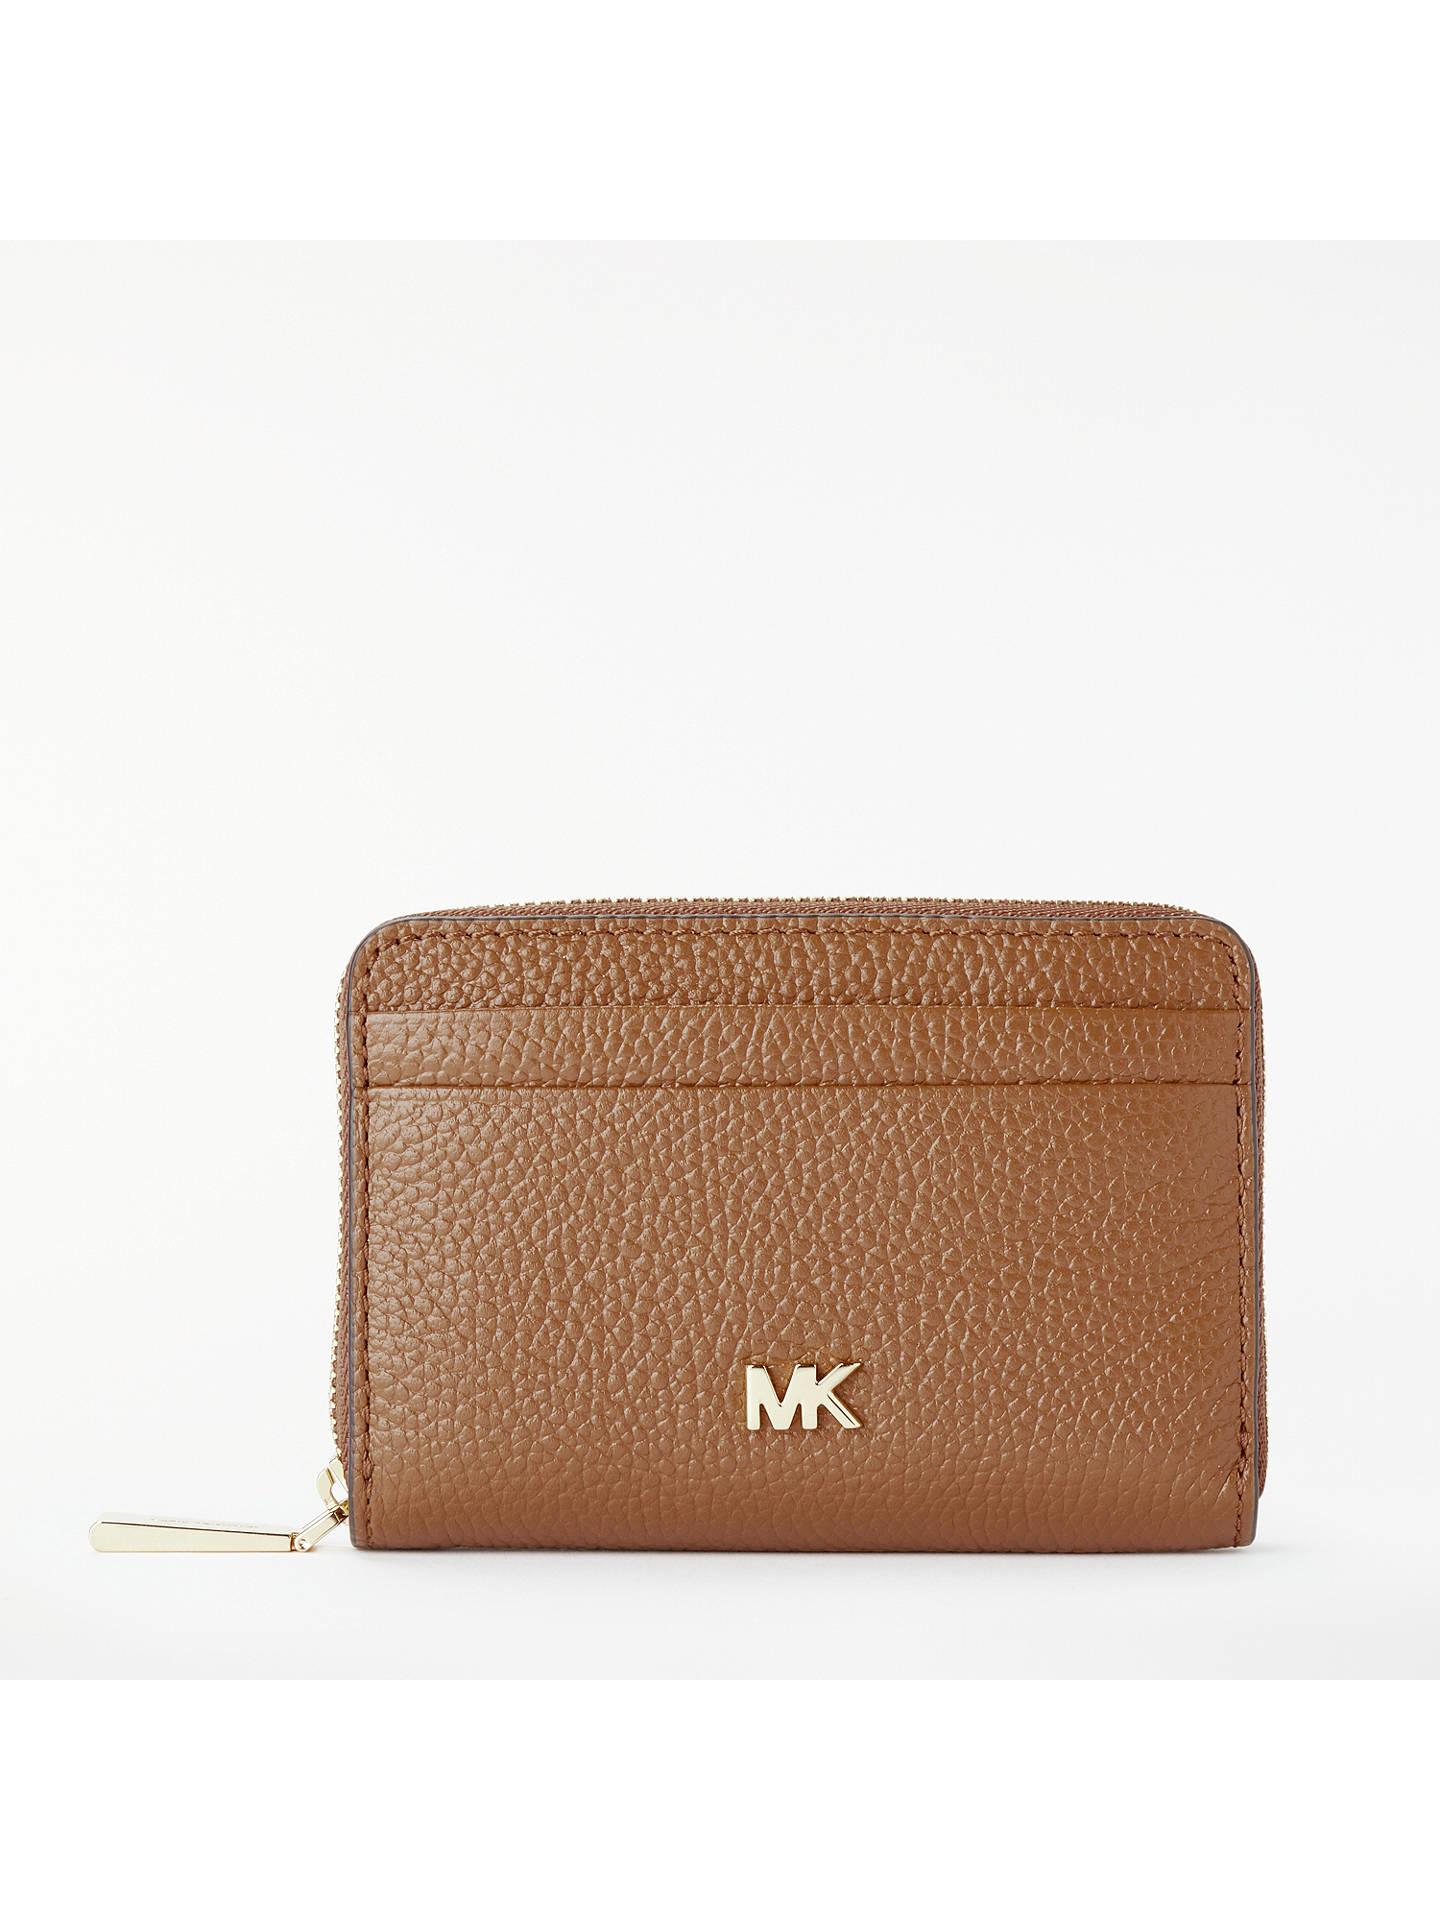 489153b495b844 Buy MICHAEL Michael Kors Money Pieces Leather Card Purse, Acorn Online at  johnlewis.com ...